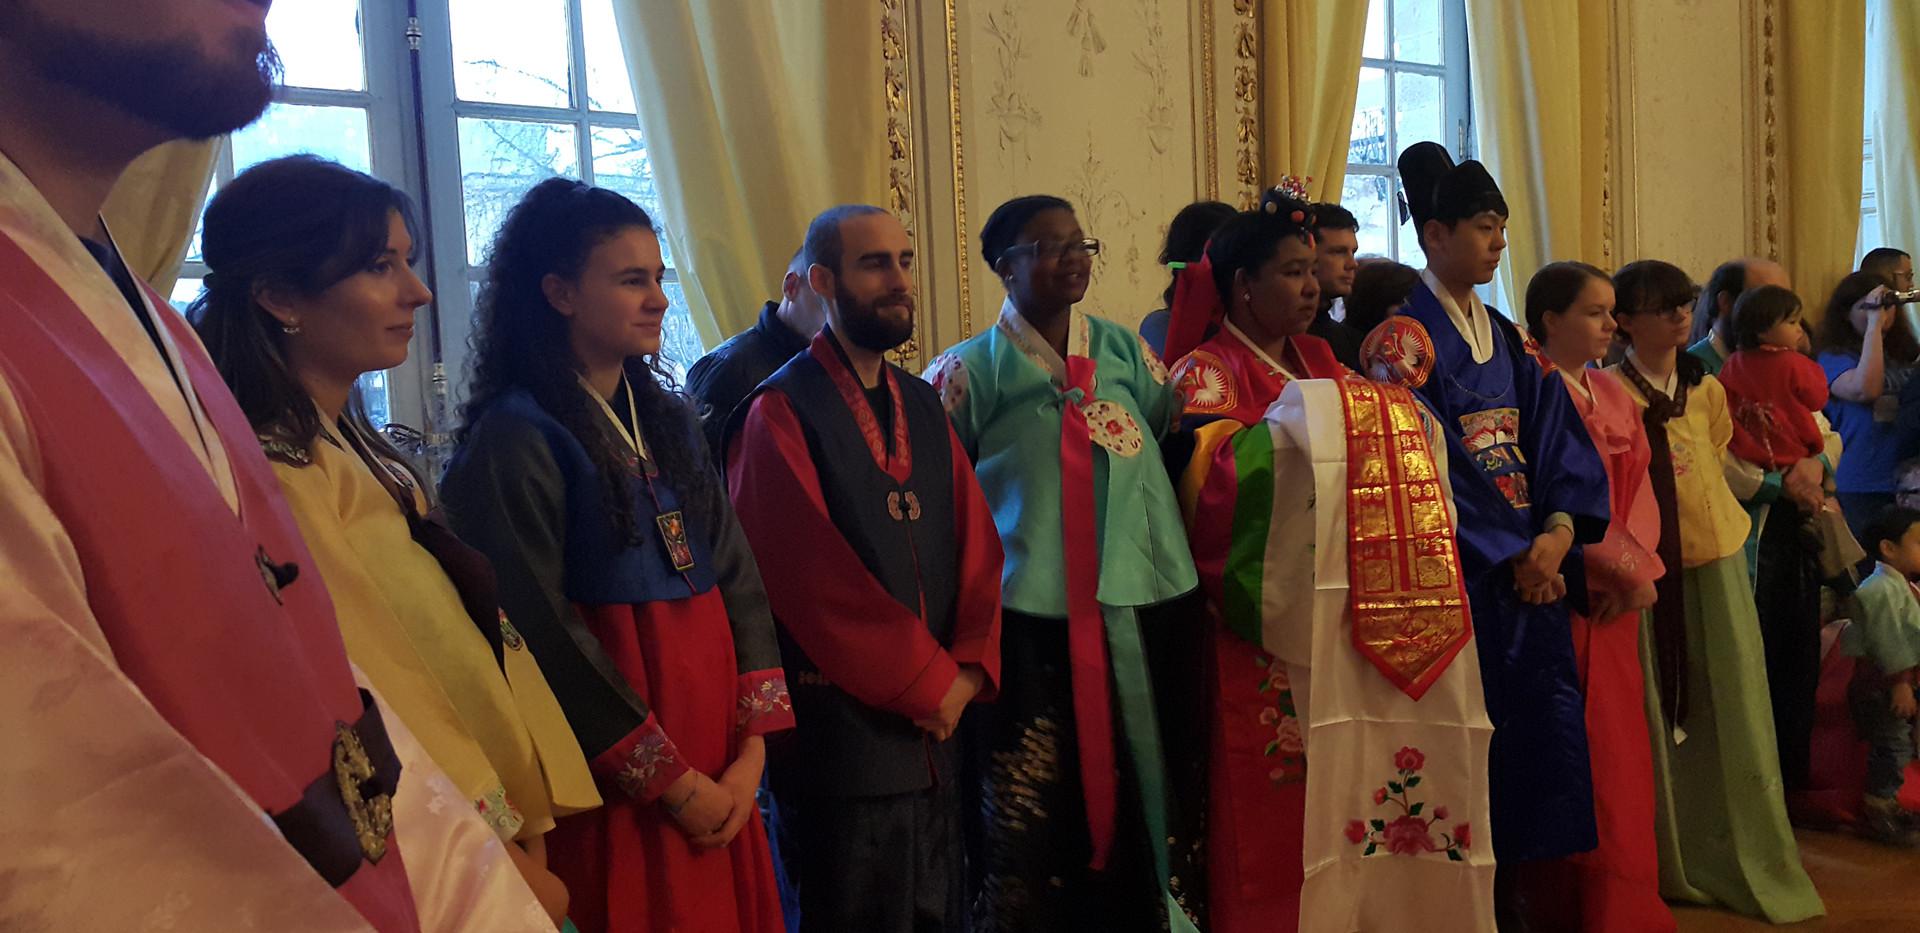 Les membres de l'association vêtus de Hanbok lors de Seollal 2019, à la mairie